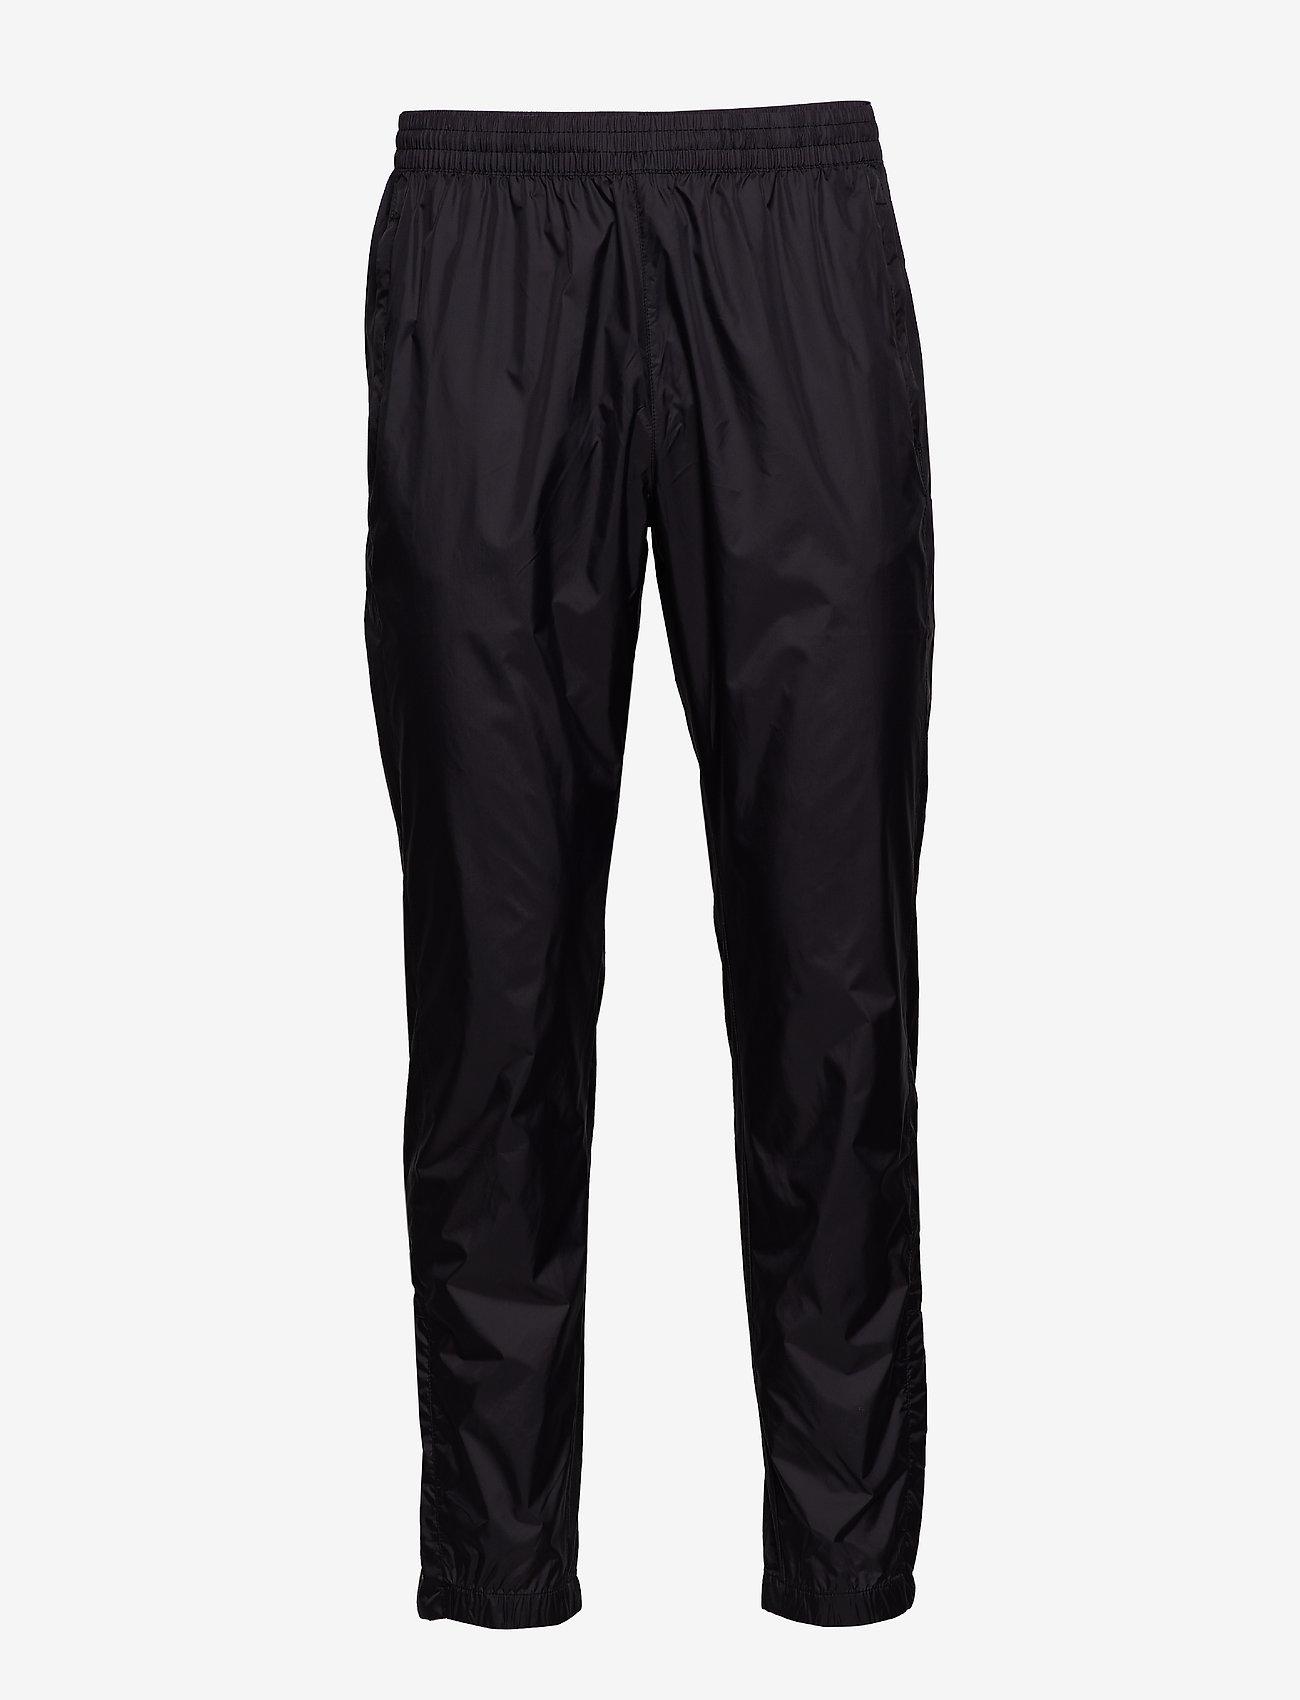 Newline - BLACK TRACK PANTS - spodnie treningowe - black - 0